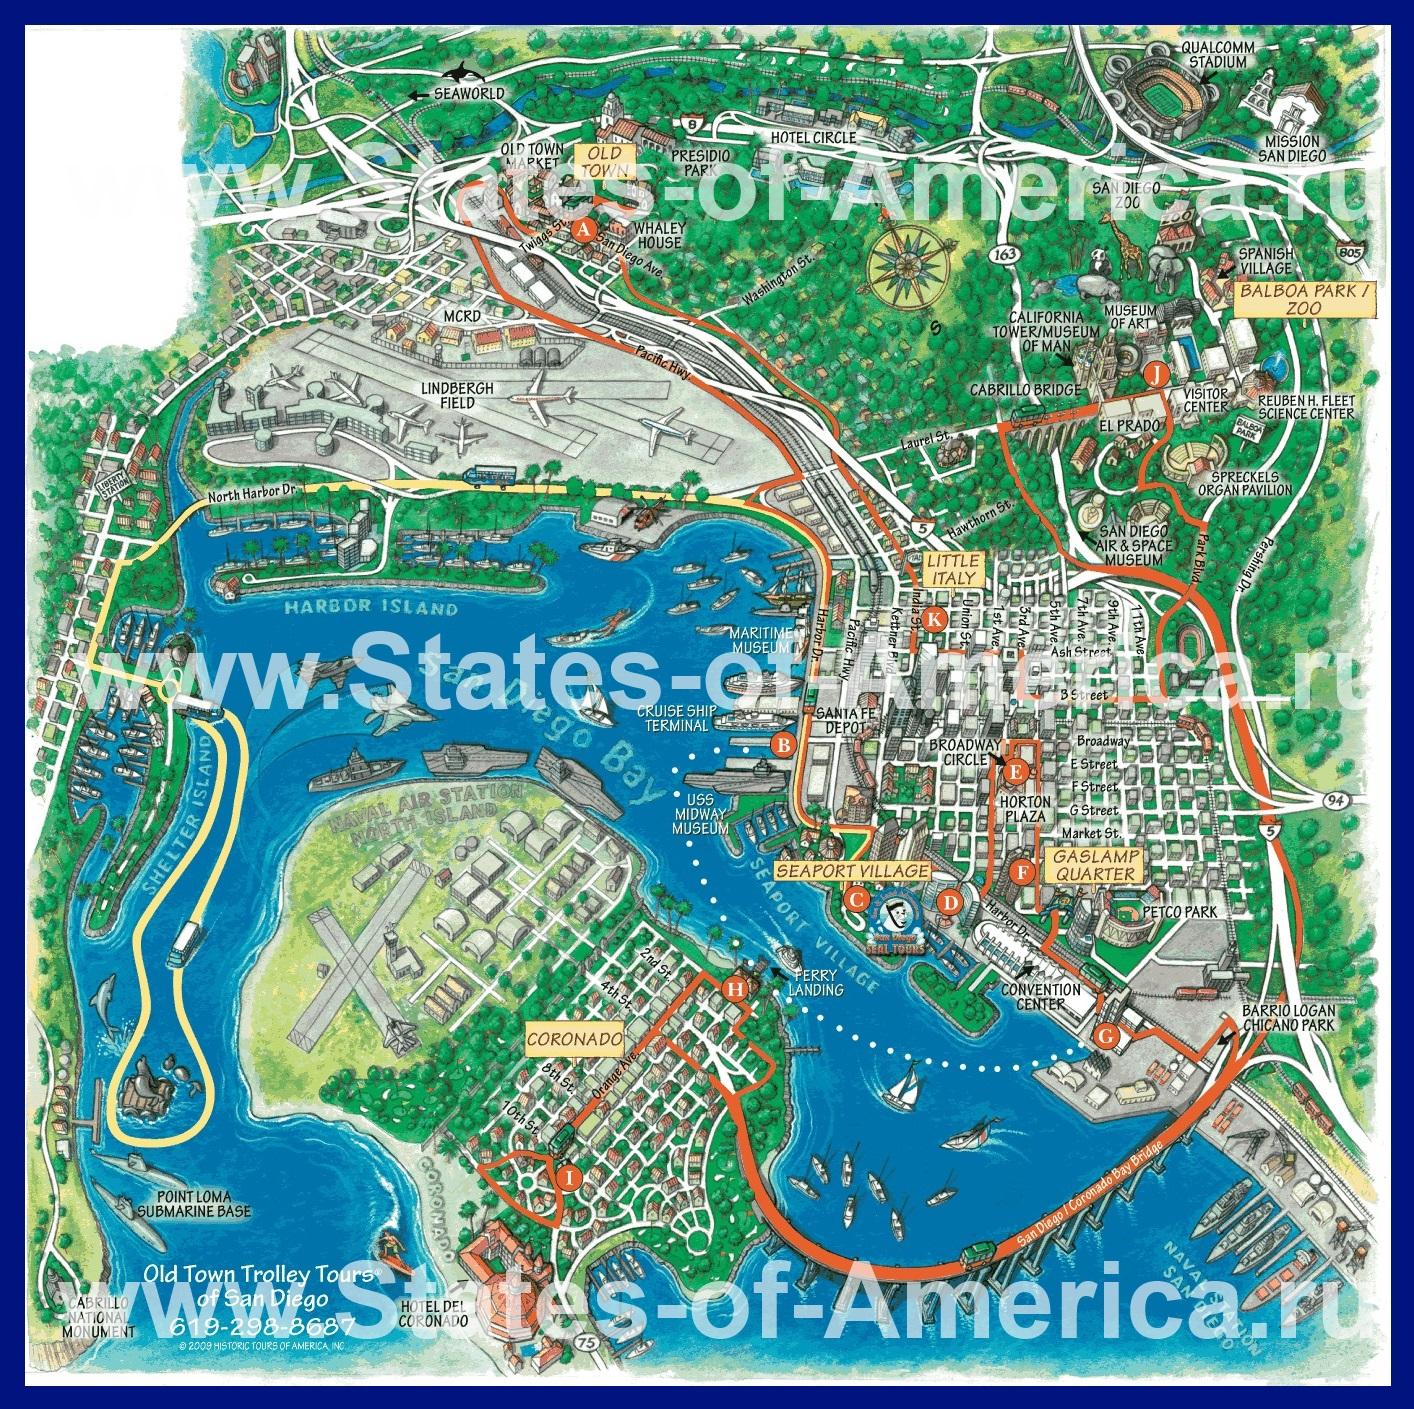 Карты Сан-Диего | Подробная карта города Сан-Диего | Сан ...: http://states-of-america.ru/karty-gorodov-ssha/san-diego/